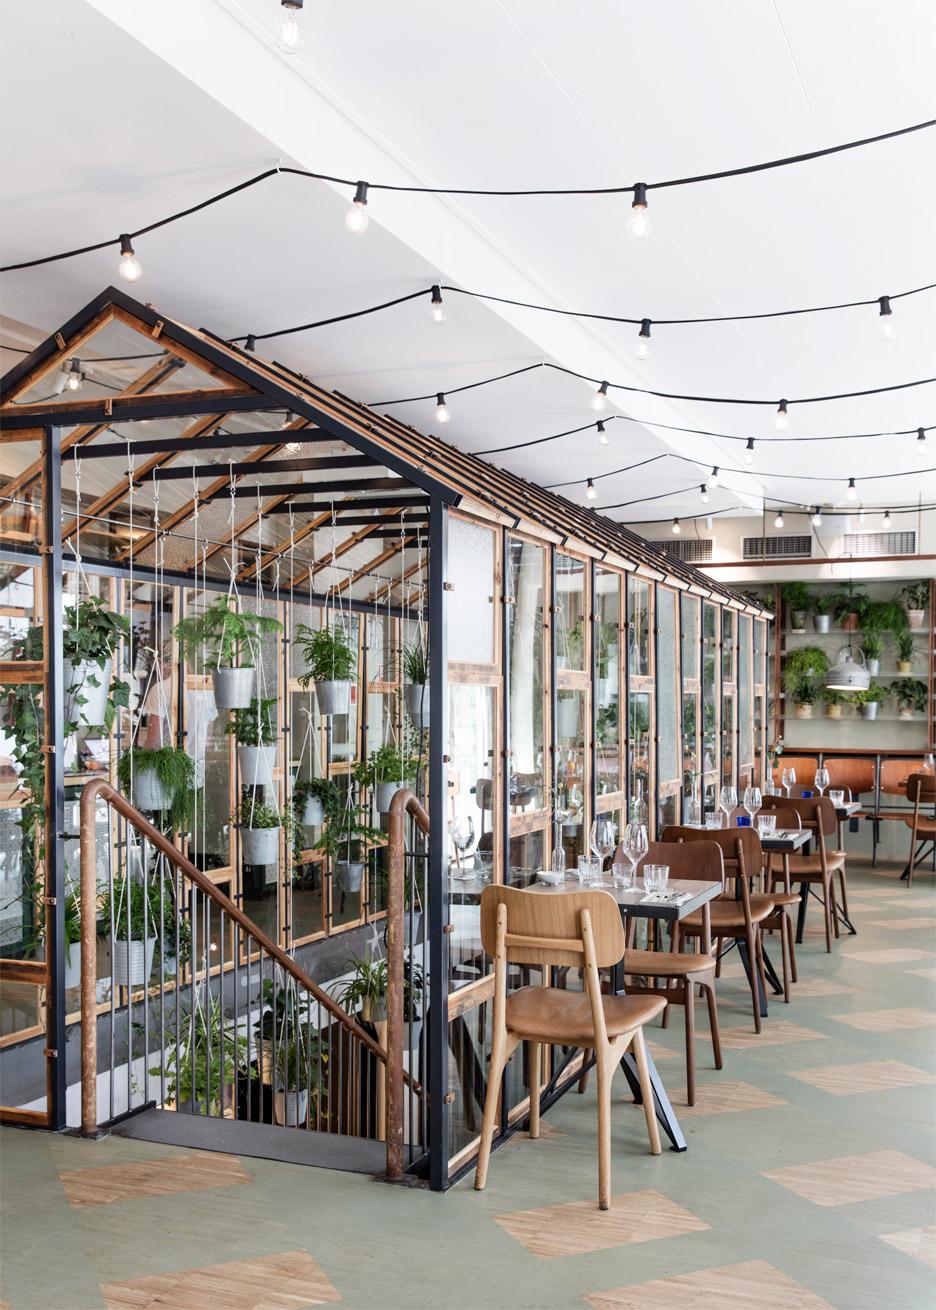 vakst-nordic-restaurant-interior-genbyg-copenhagen-denmark-chris-tonnesen_dezeen_936_6.jpg